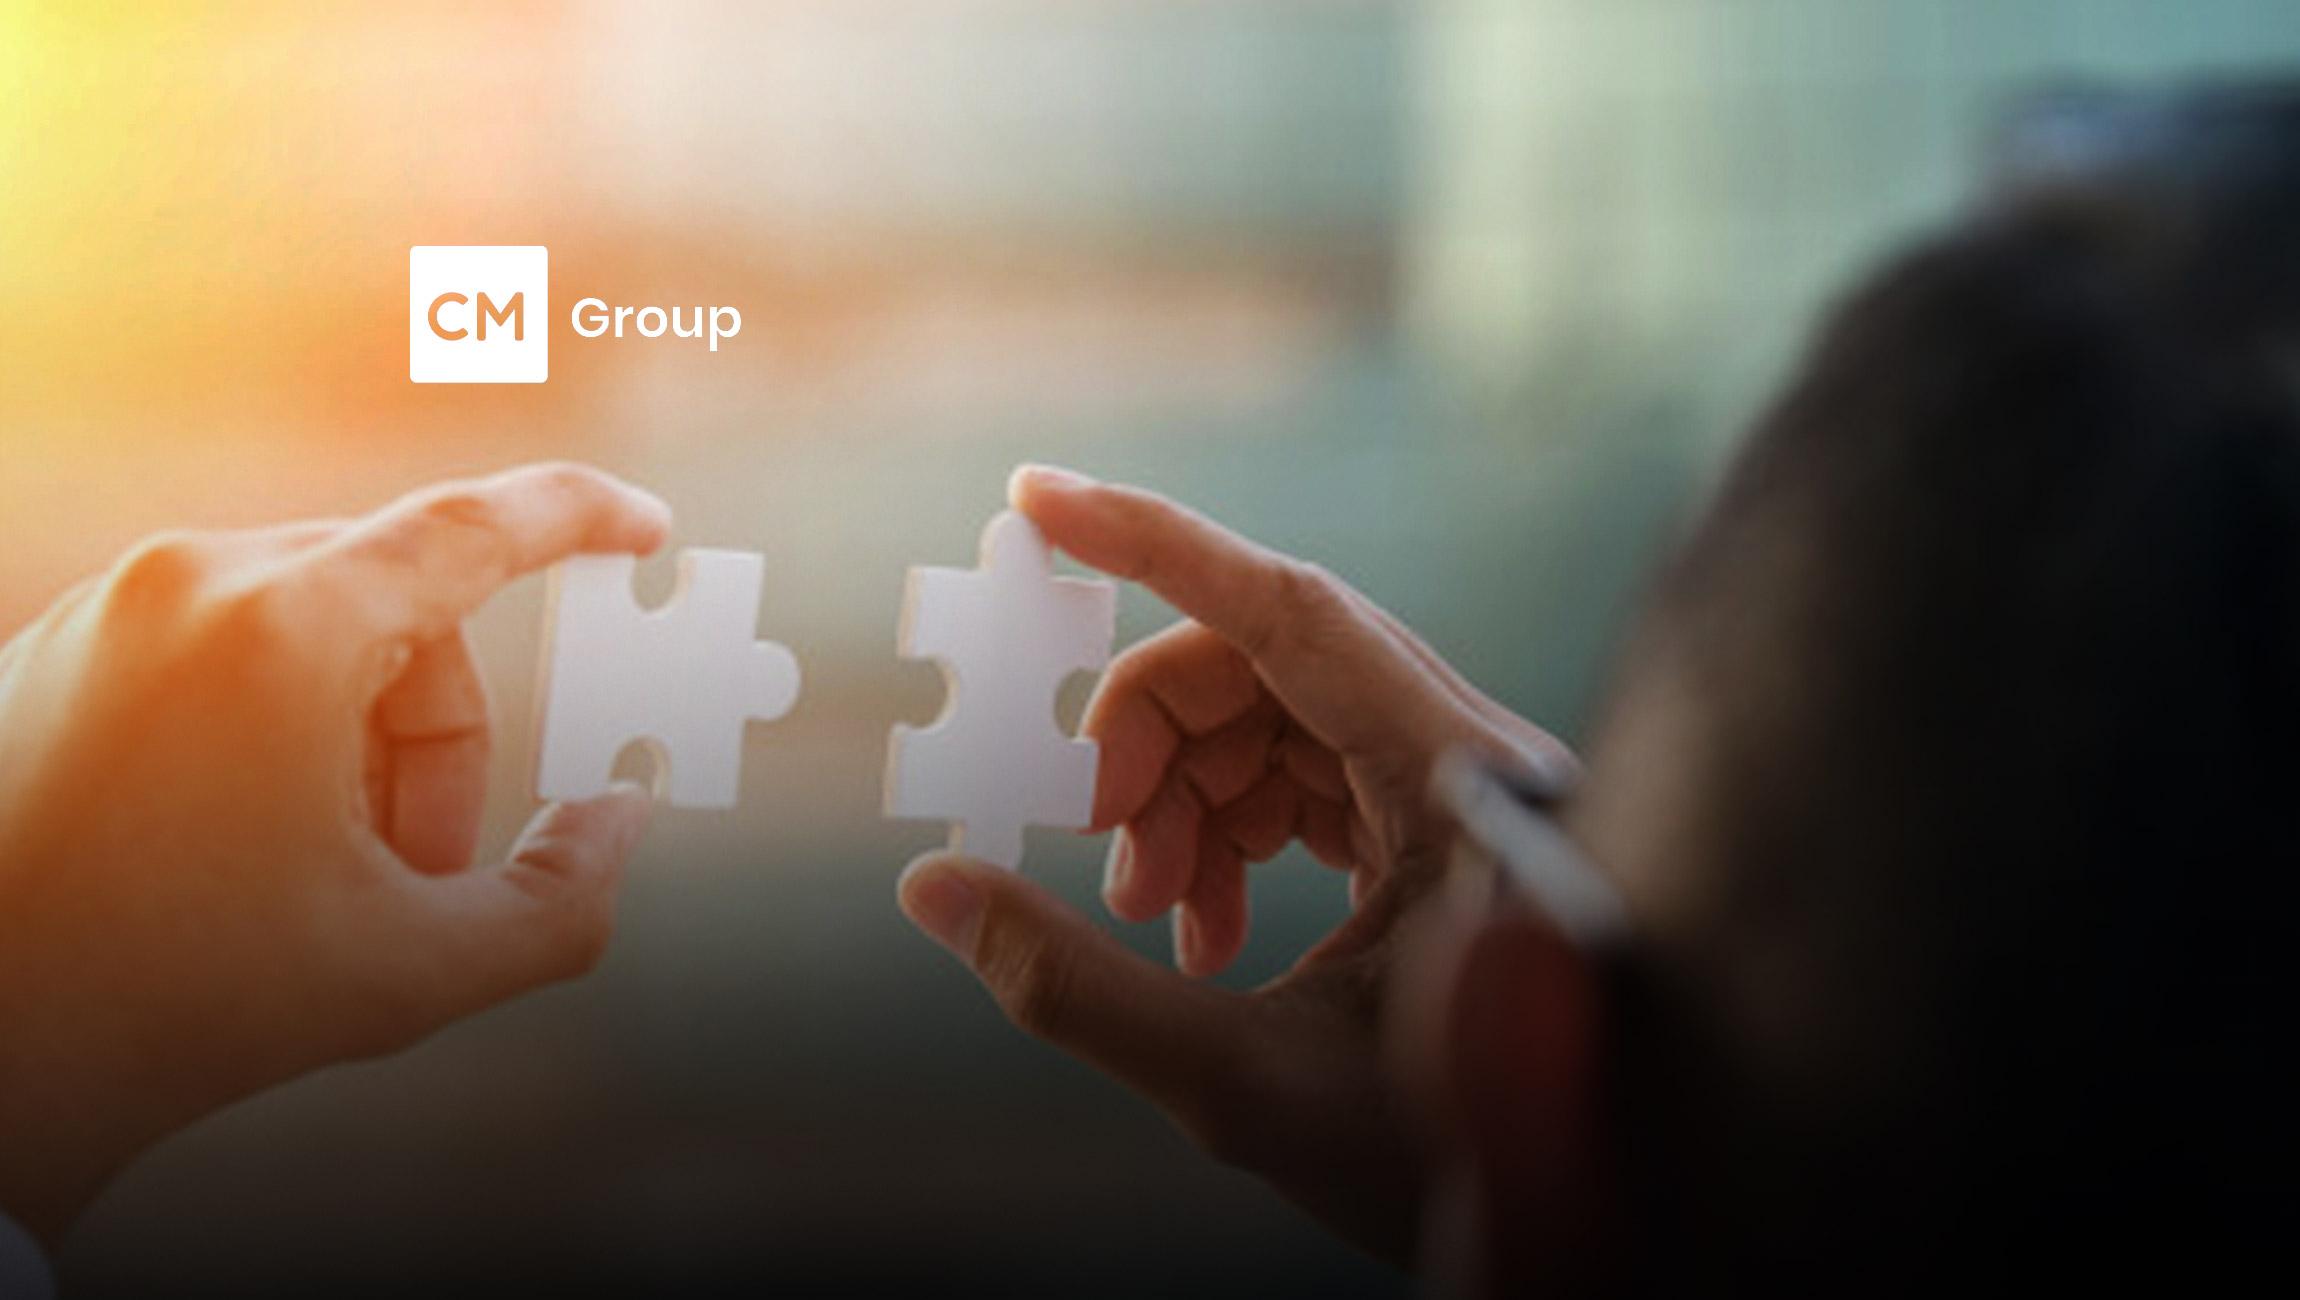 CM Group Acquires Selligent Marketing Cloud